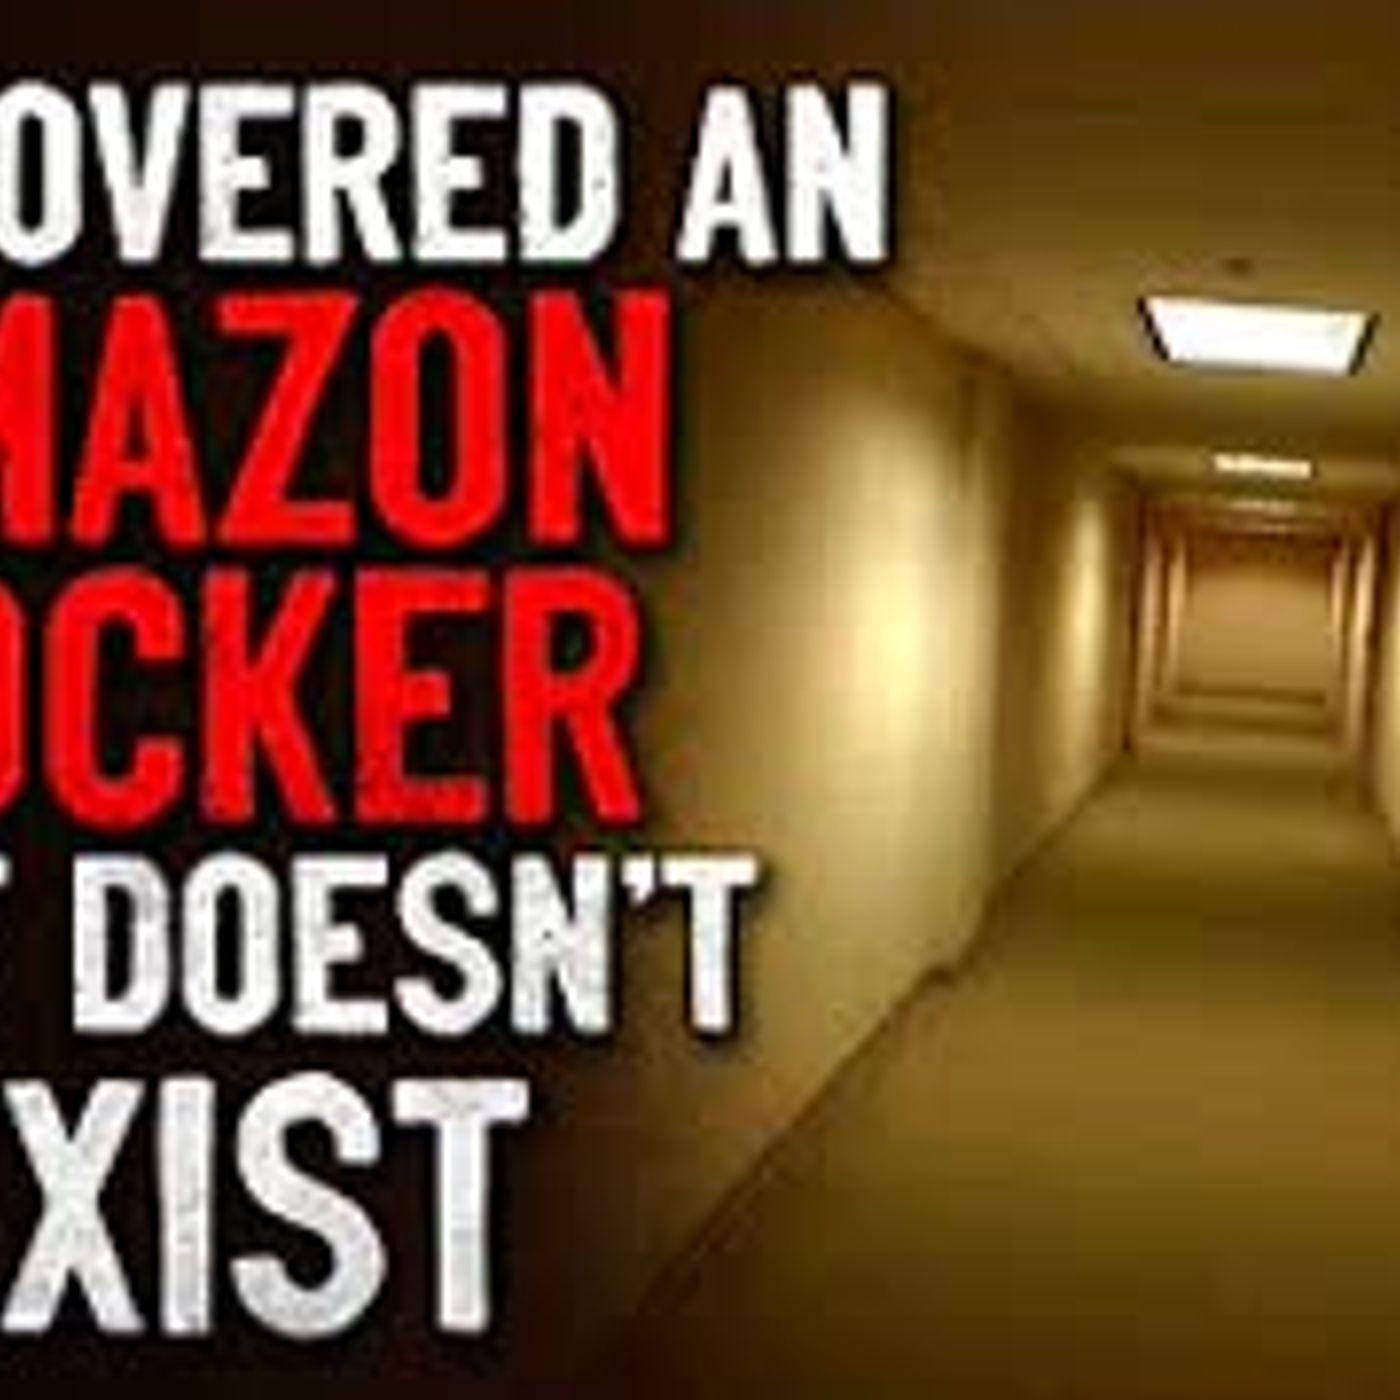 """I Discovered an Amazon Locker that Doesn't Exist"" Creepypasta"